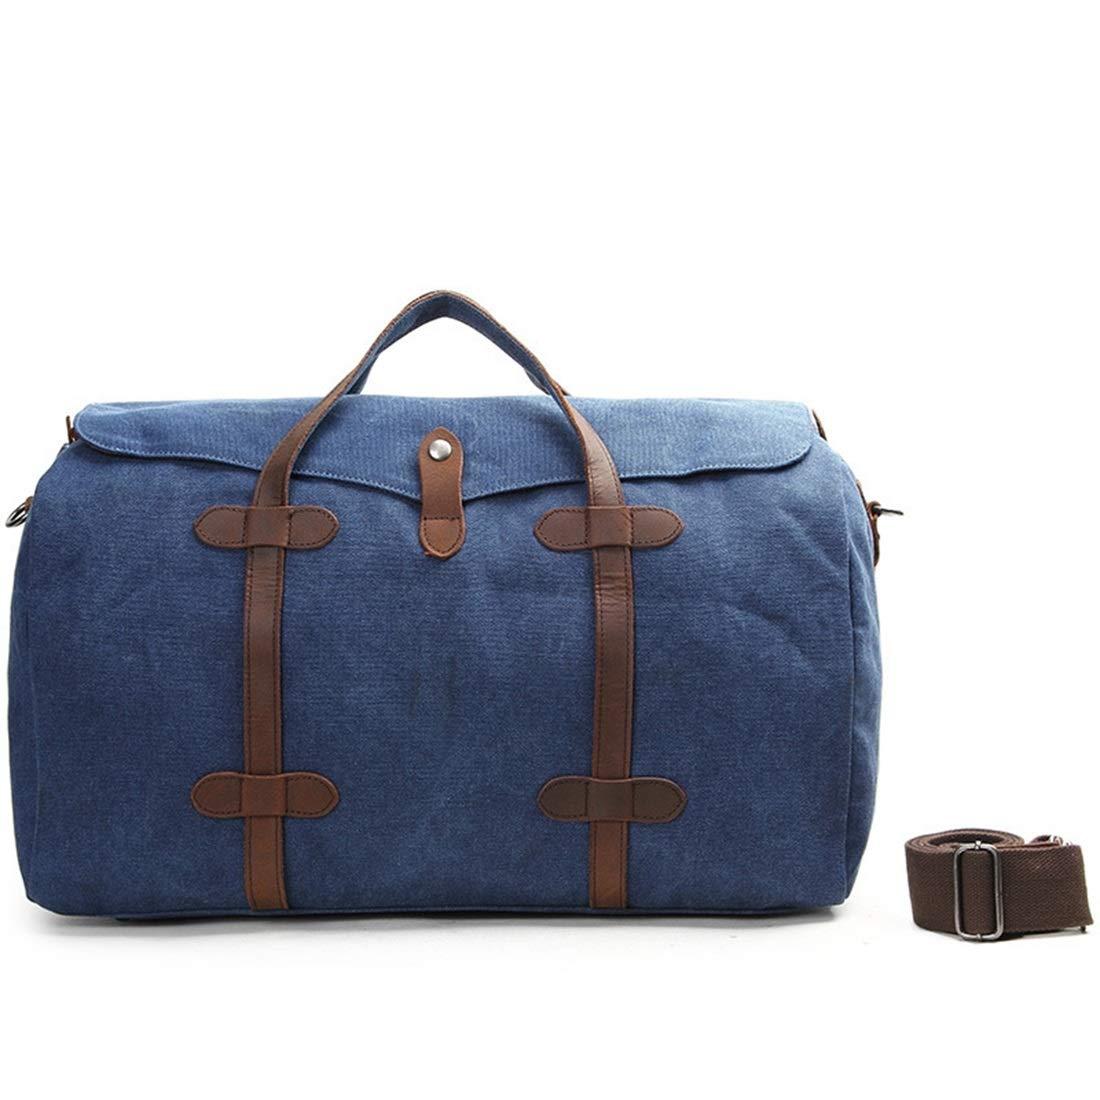 Linannau ハンドメイドキャンバススローン手荷物バッグメンズハンドトラベルバッグウィークエンドバッグ大容量 (Color : Royal blue) B07MMGM2YD Royal blue